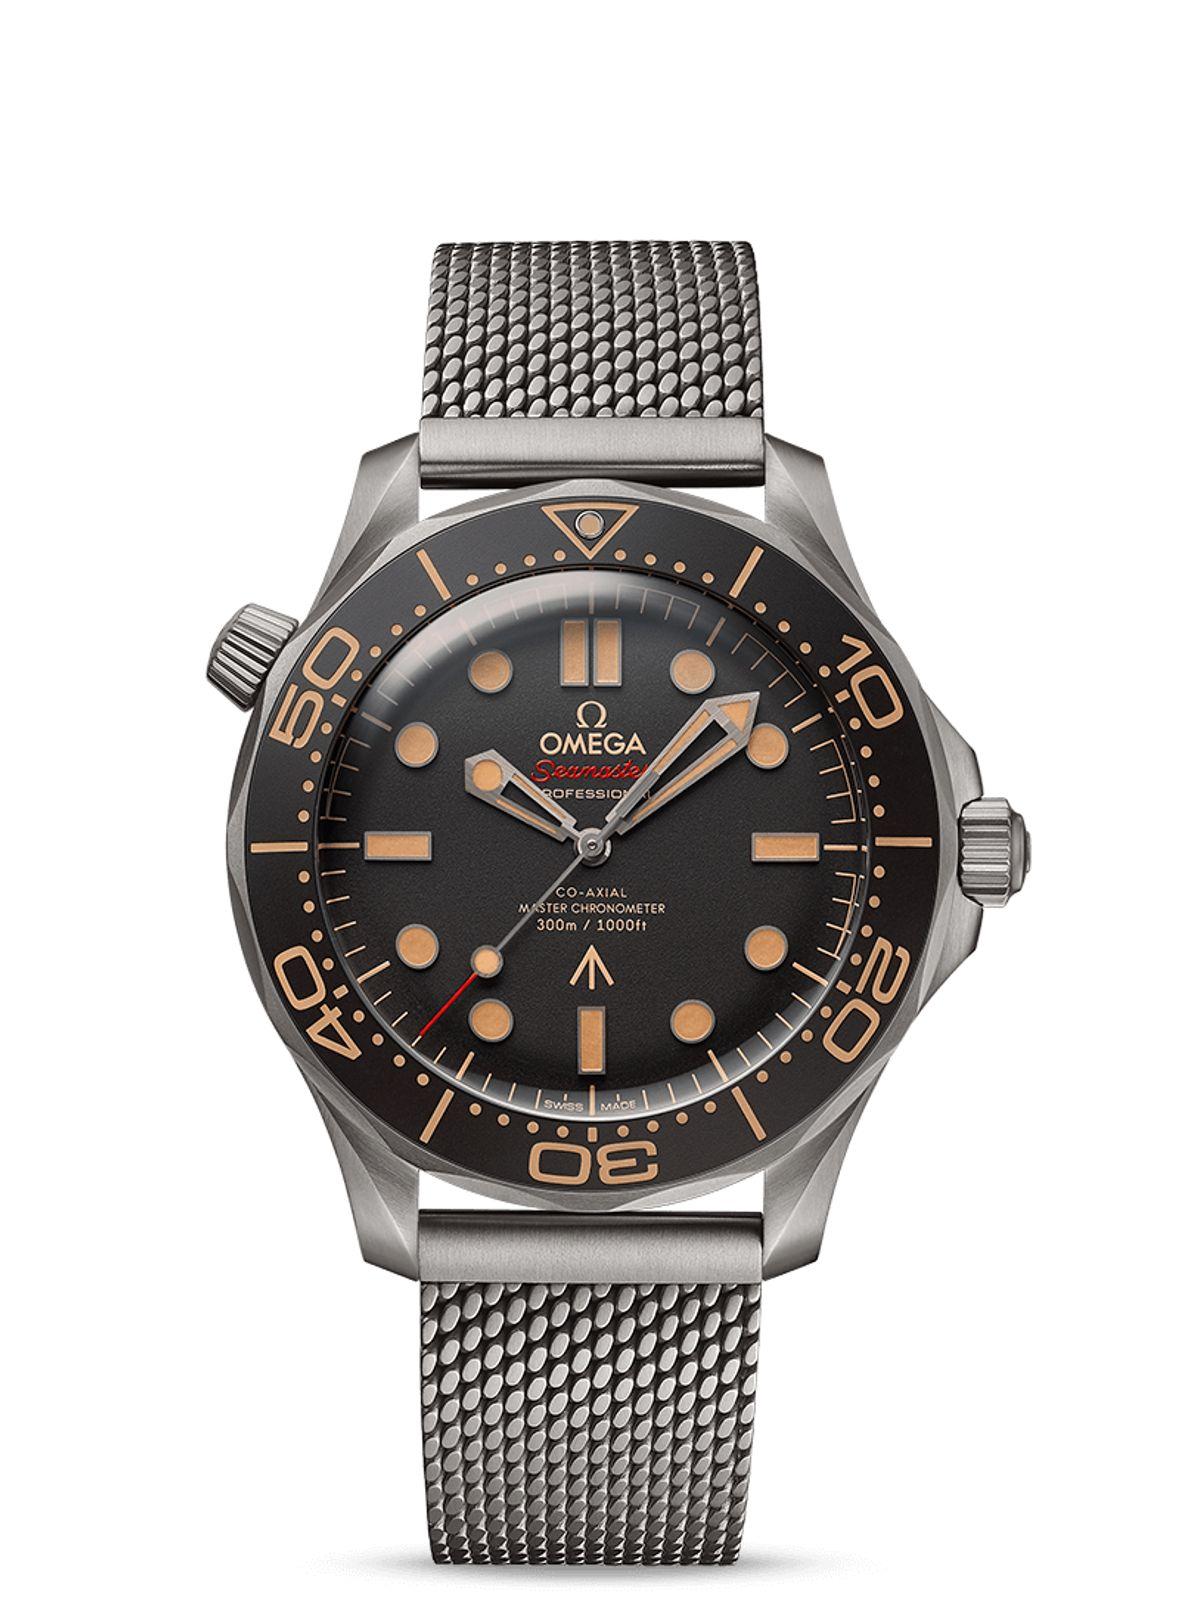 James Bond Omega Seamaster Titanium Diver 300M No Time to Die